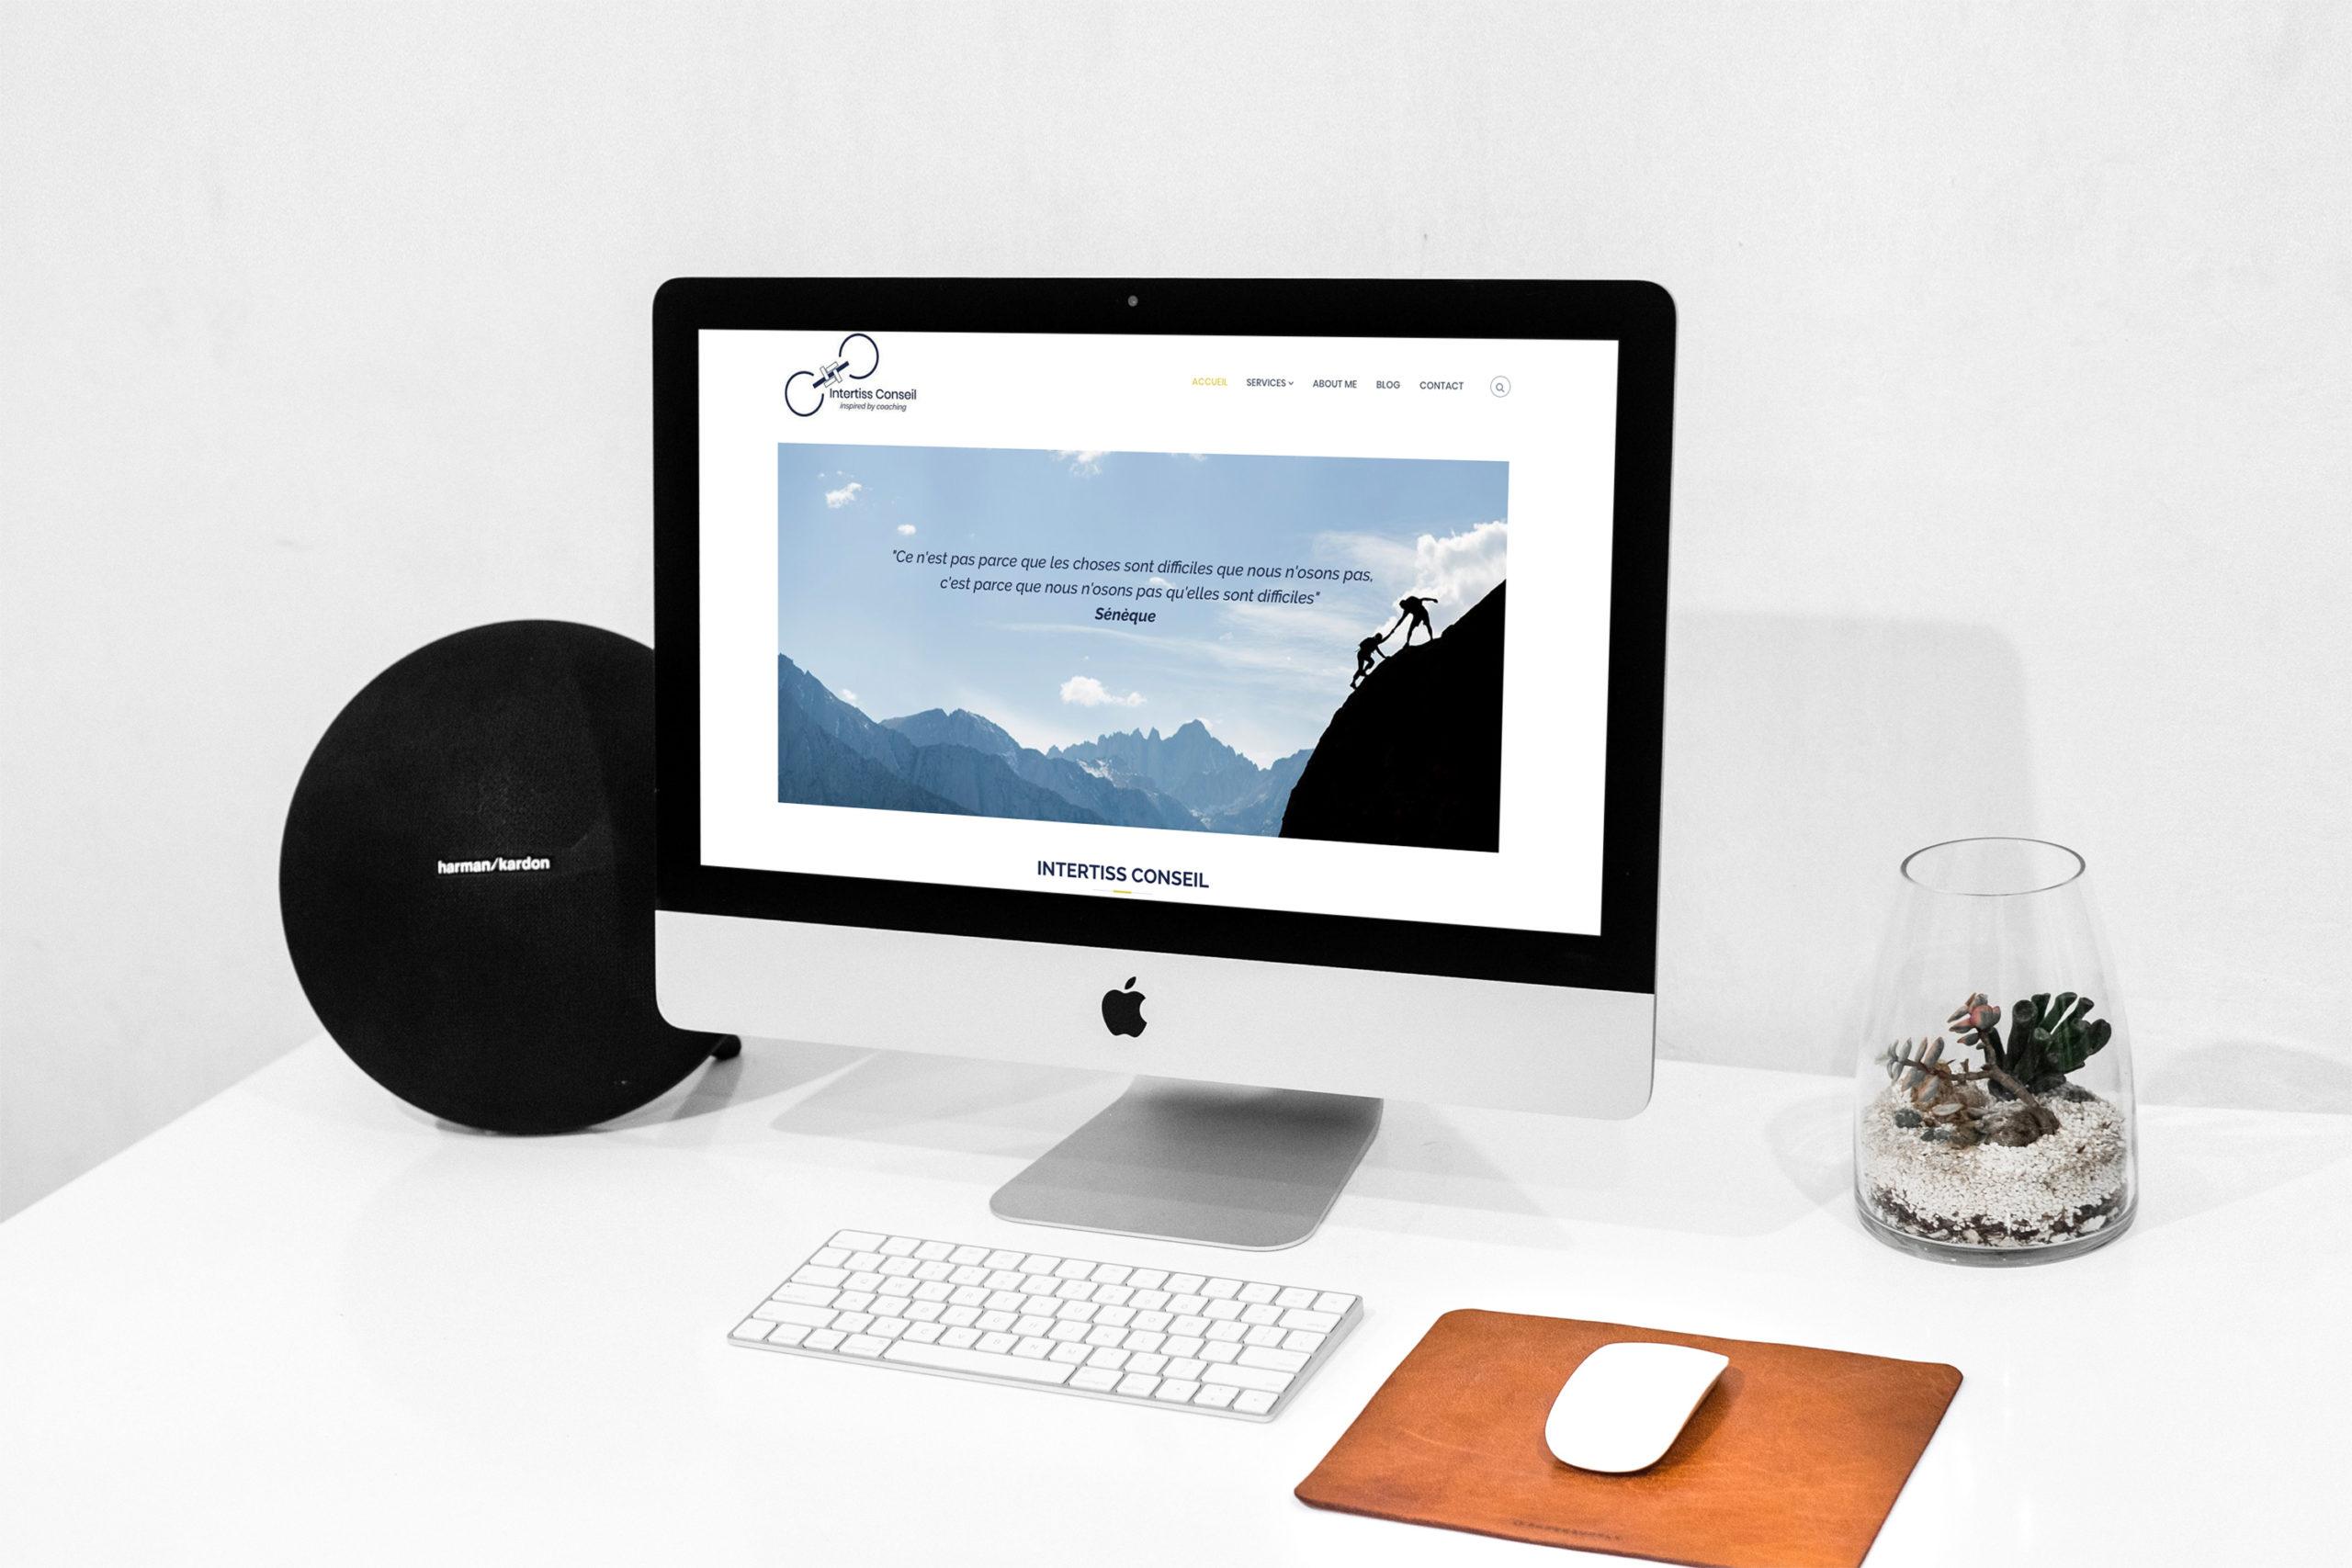 conception du site internet INTERTISS CONSEIL